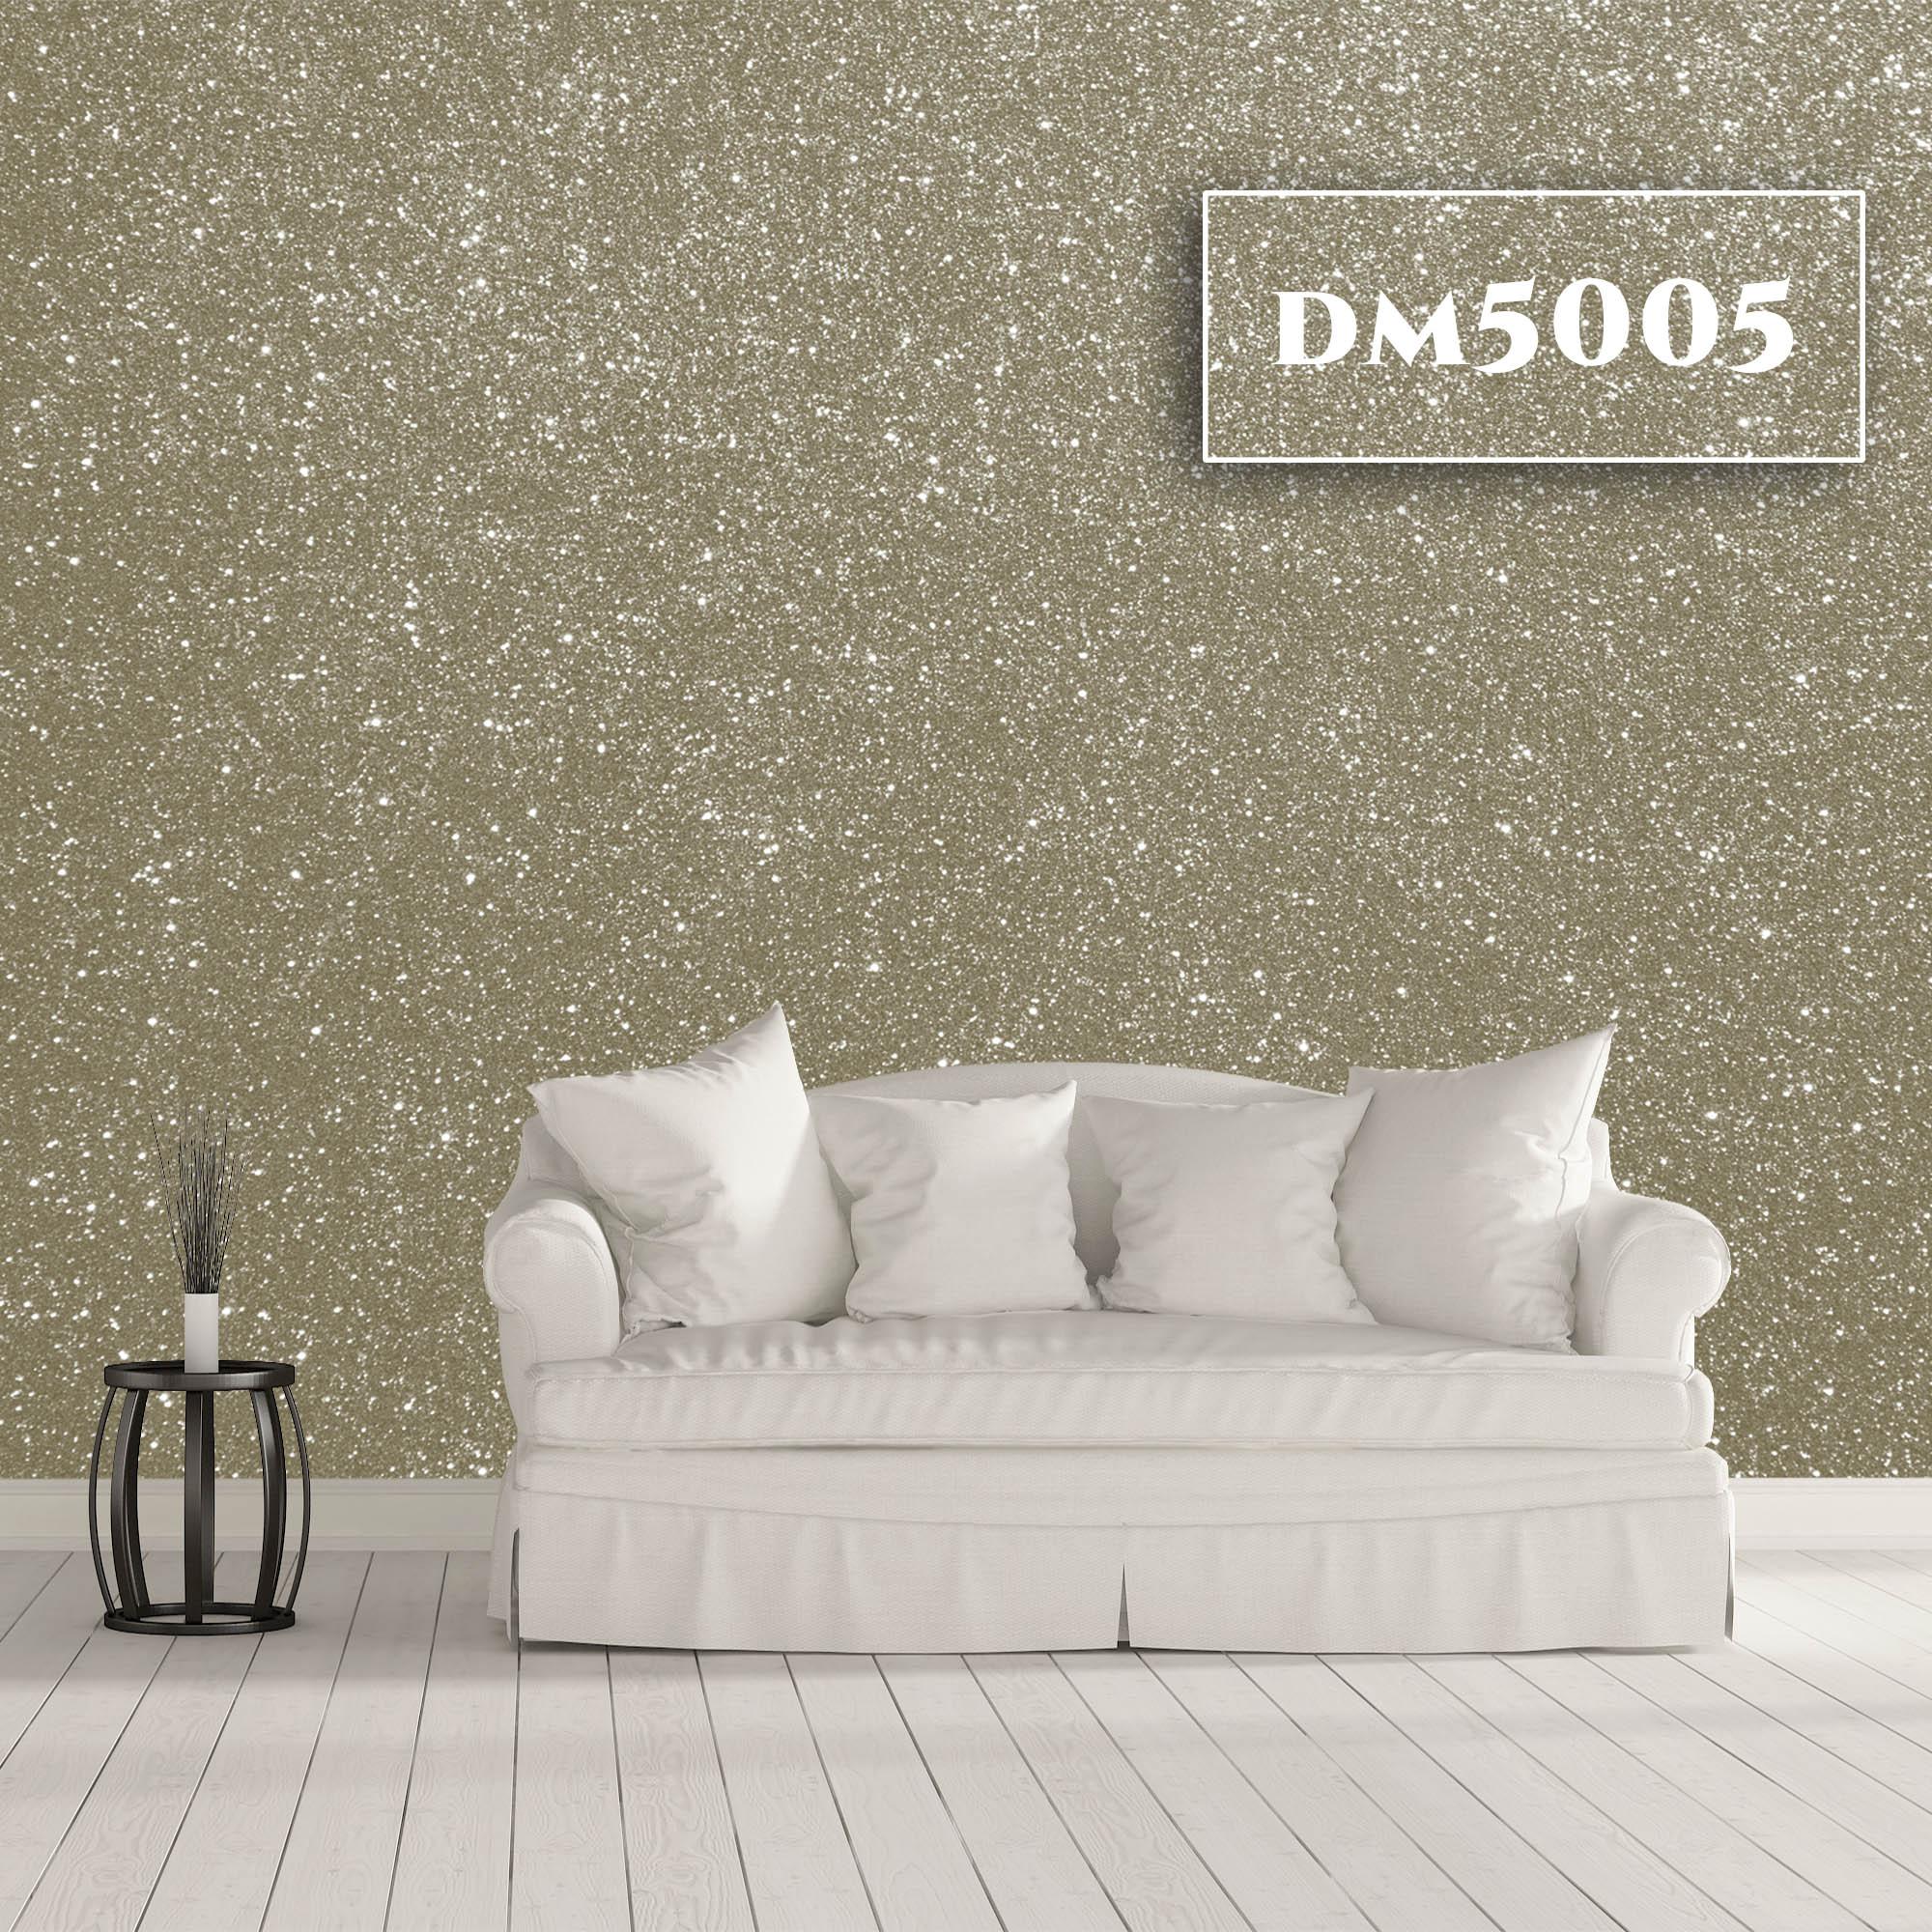 DM5005